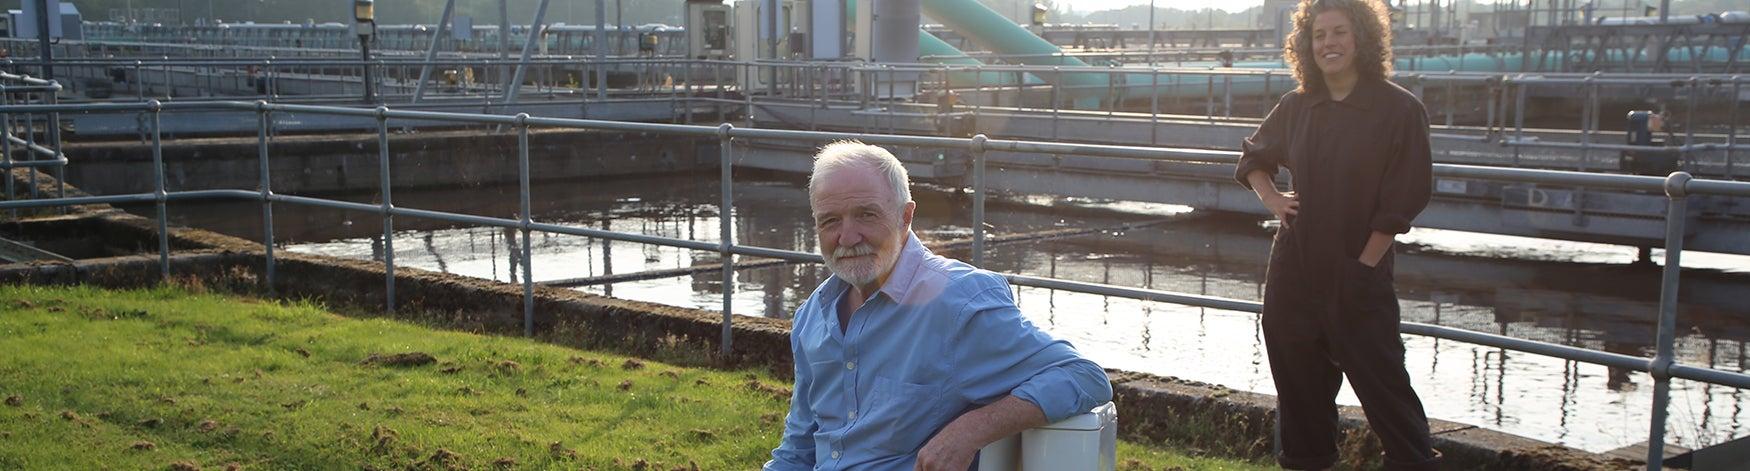 The Secret Science of Sewage BBC series promo image